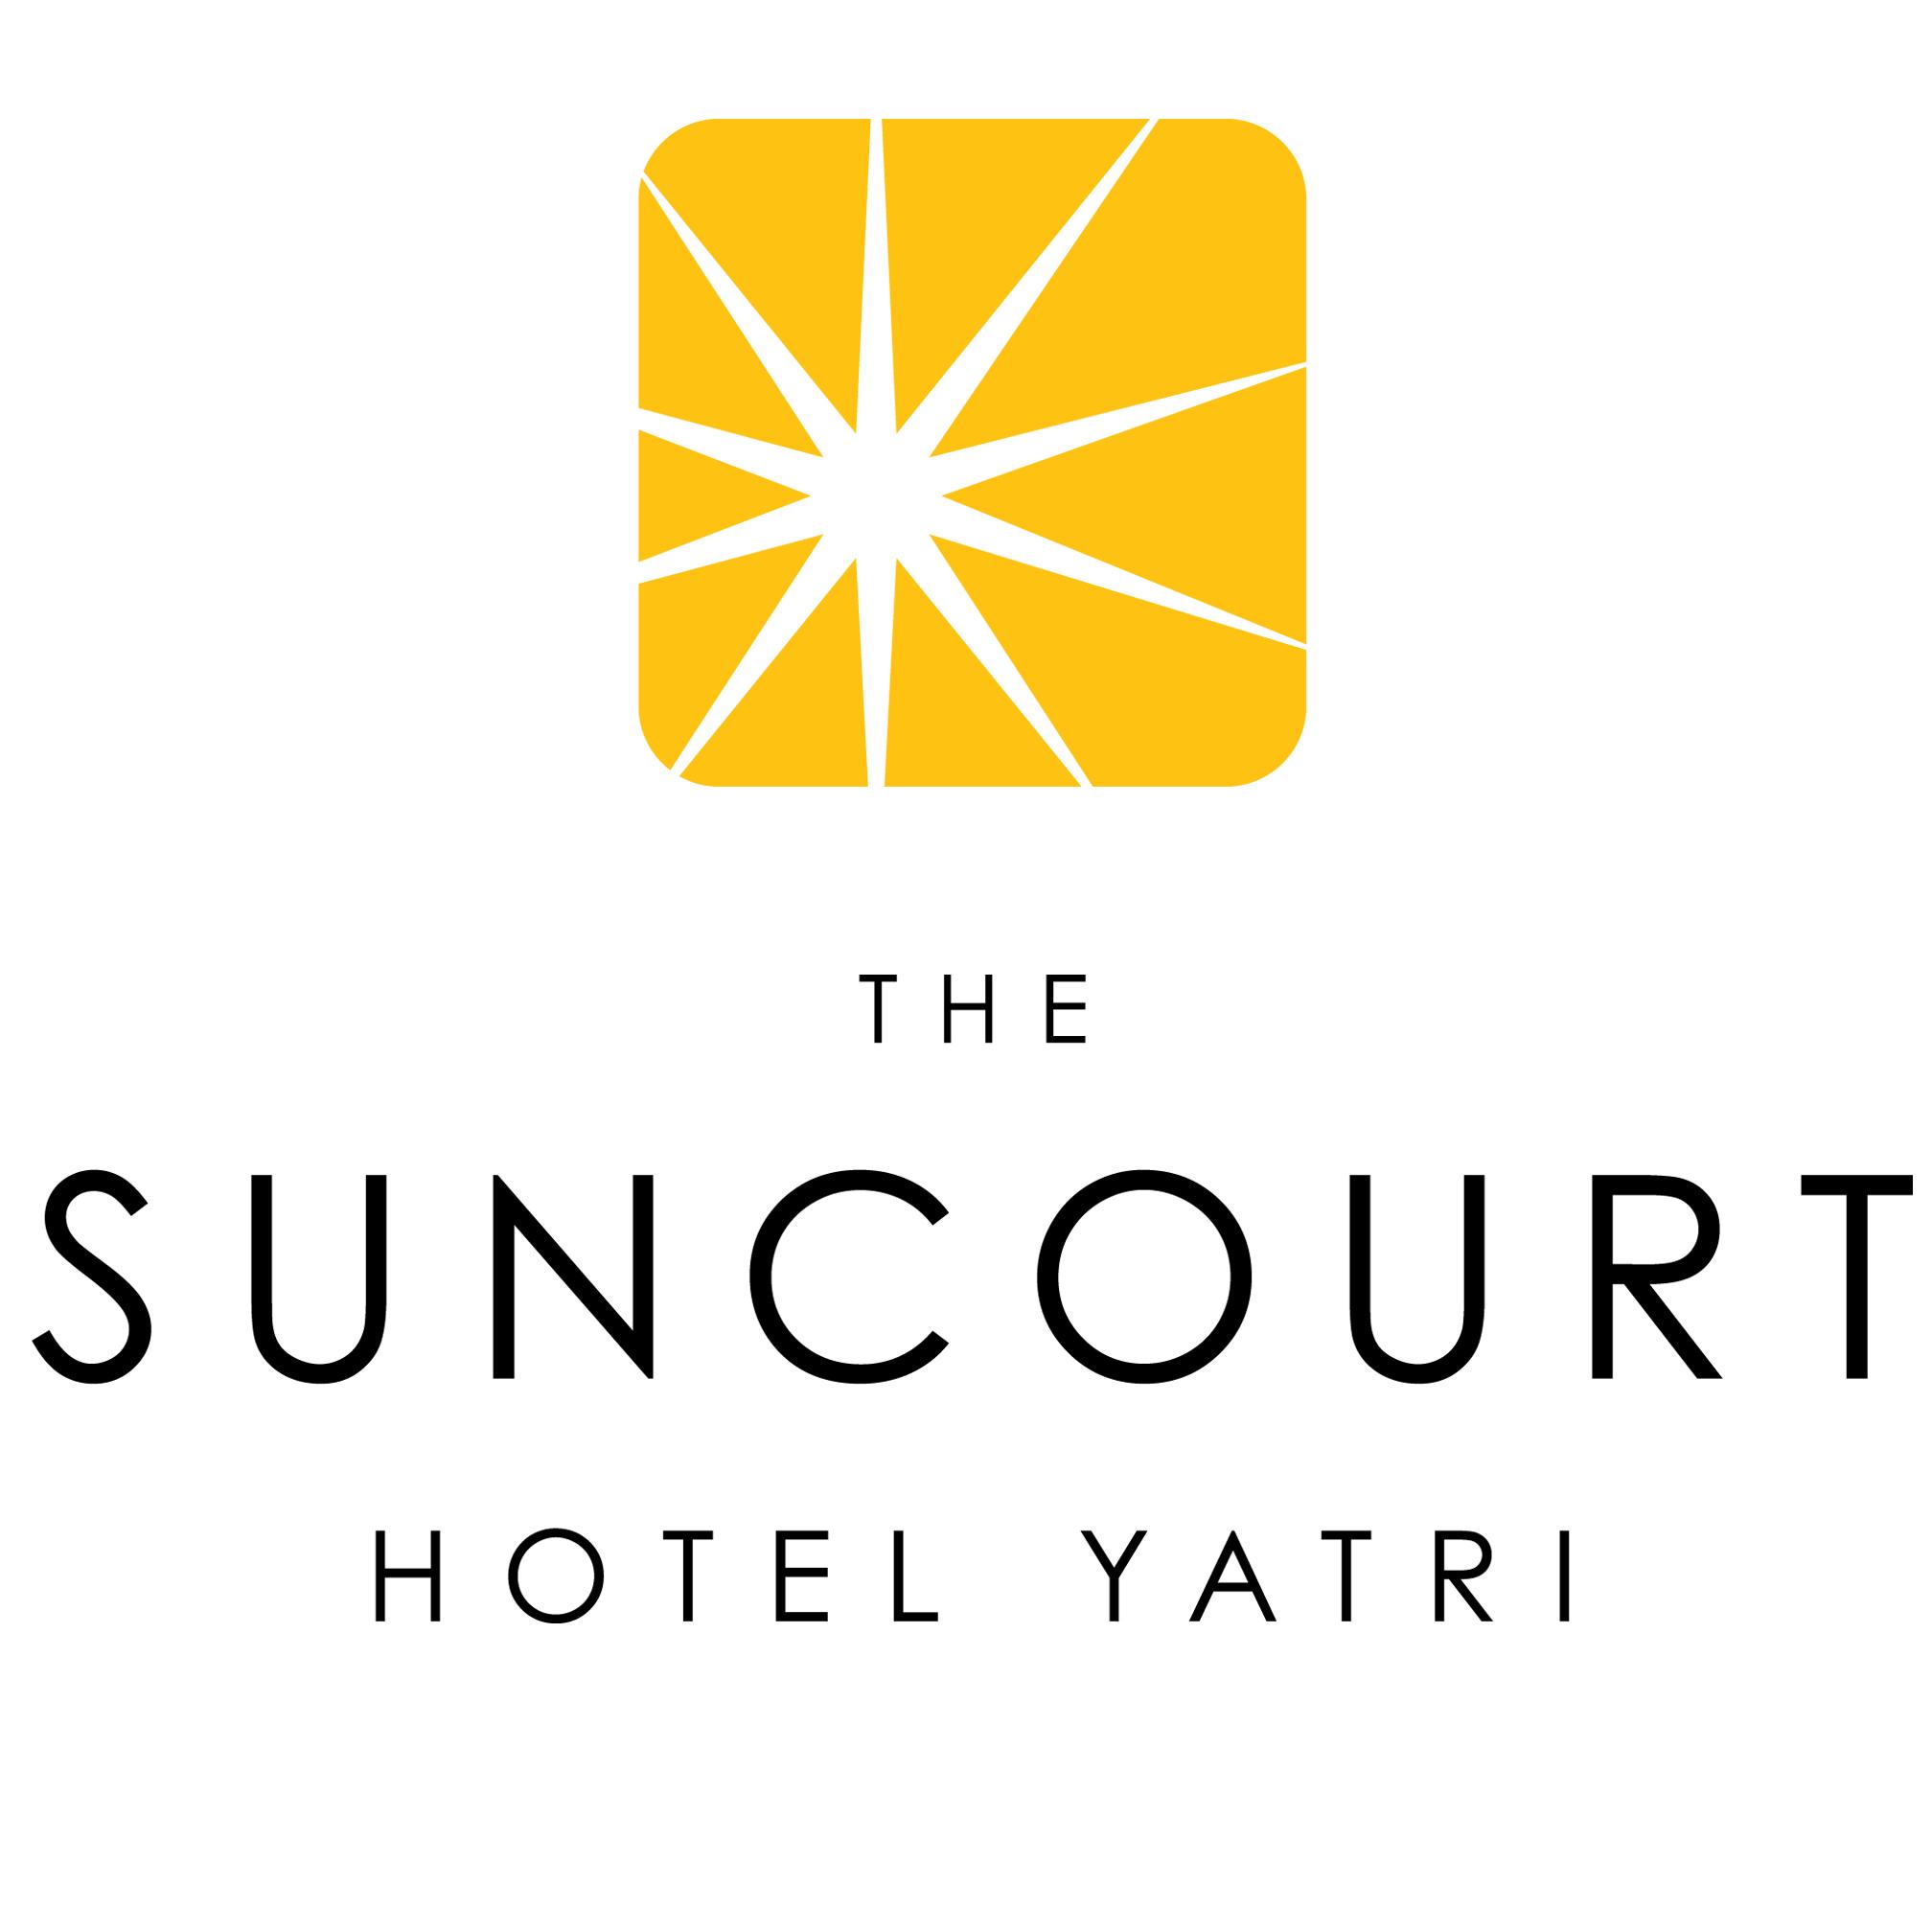 Suncourt Hotel Yatri - New Delhi, India